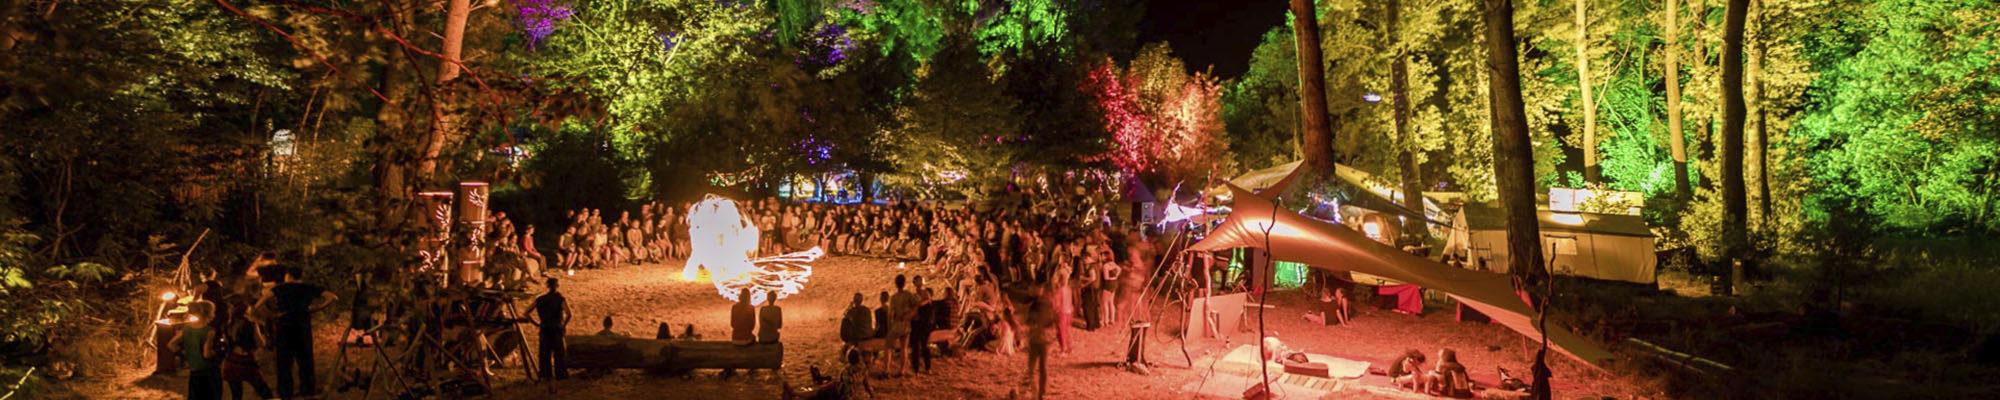 Auerworld Festival